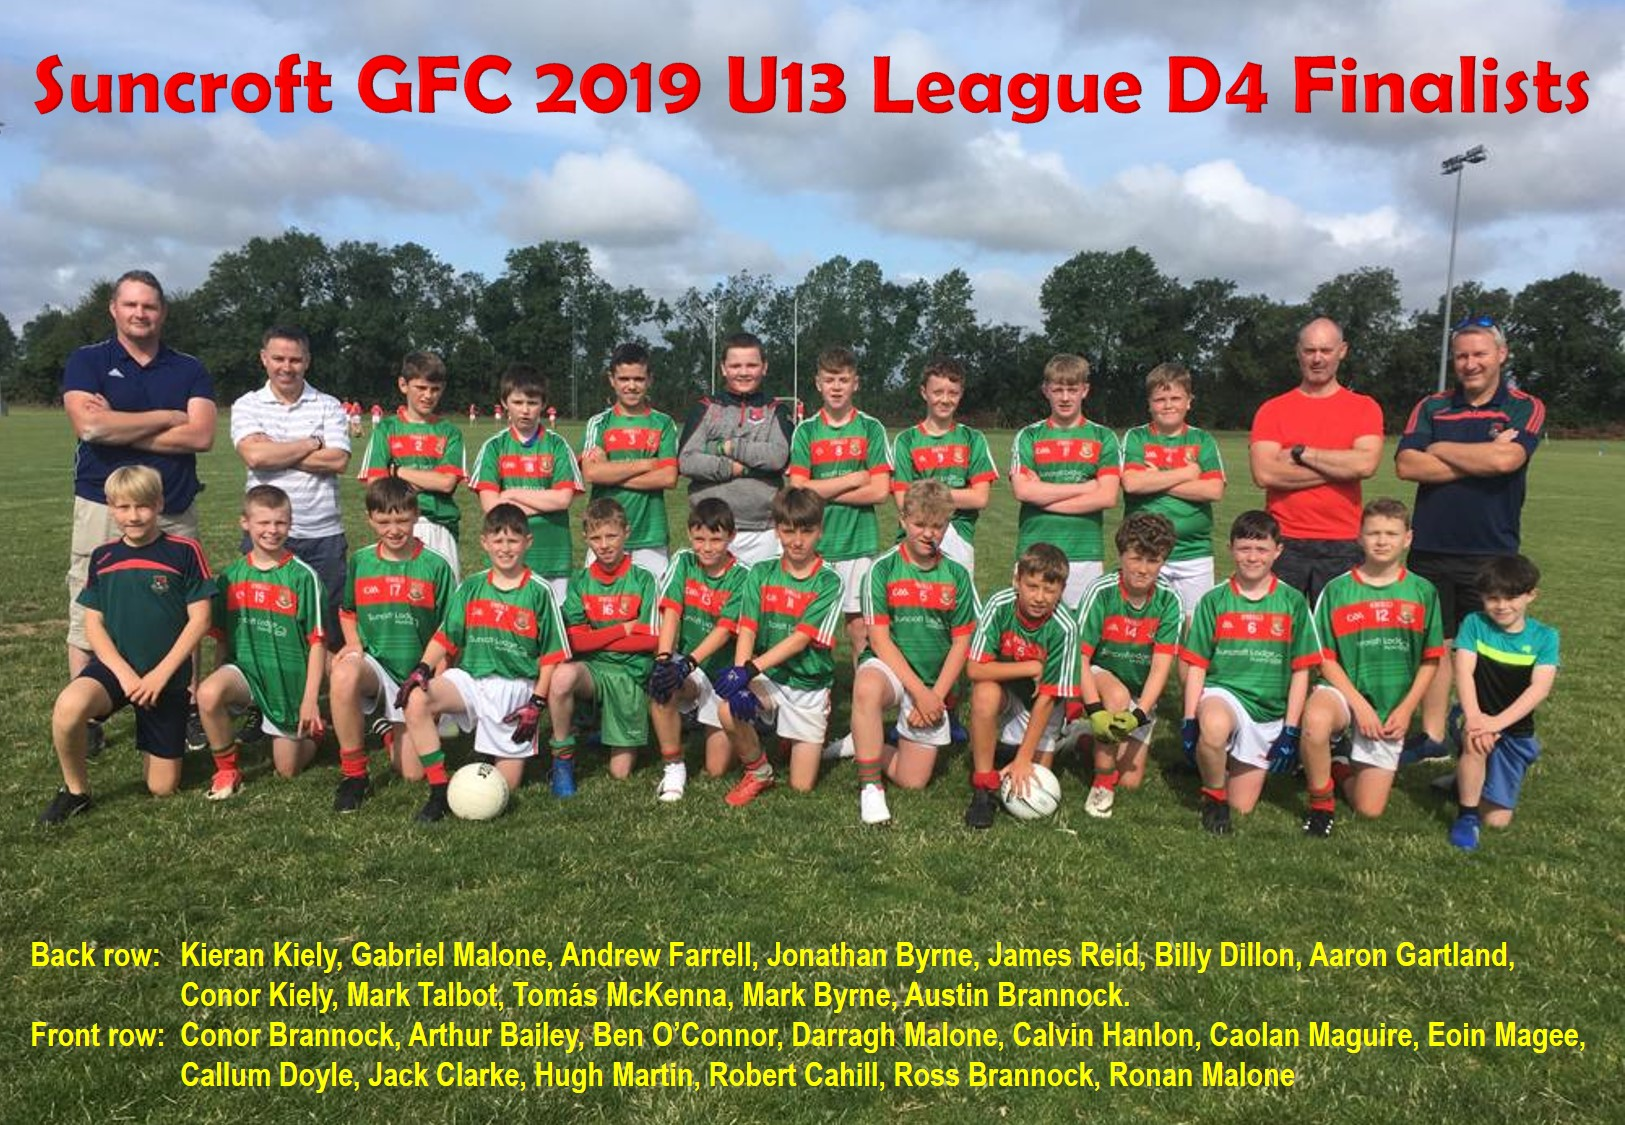 U13 League D4 Finalists